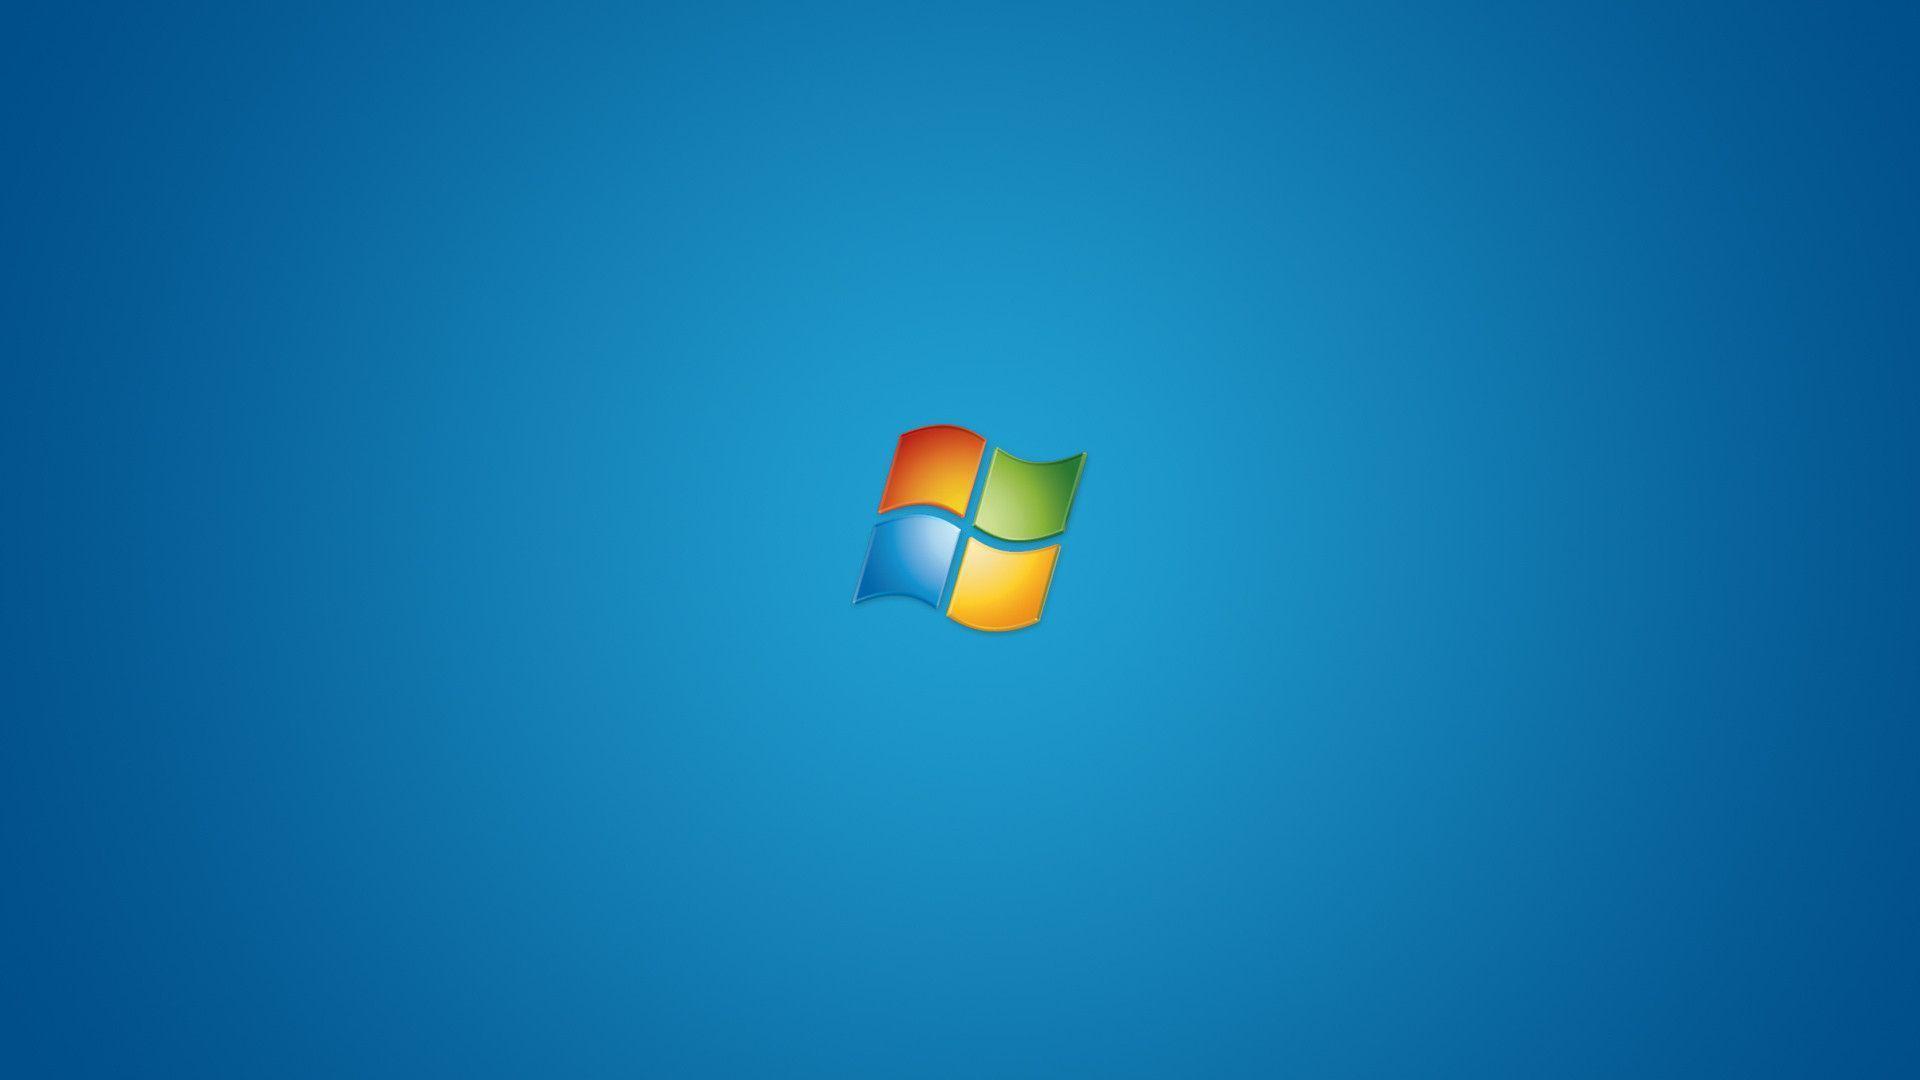 Microsoft Wallpaper Backgrounds Wallpaper Cave